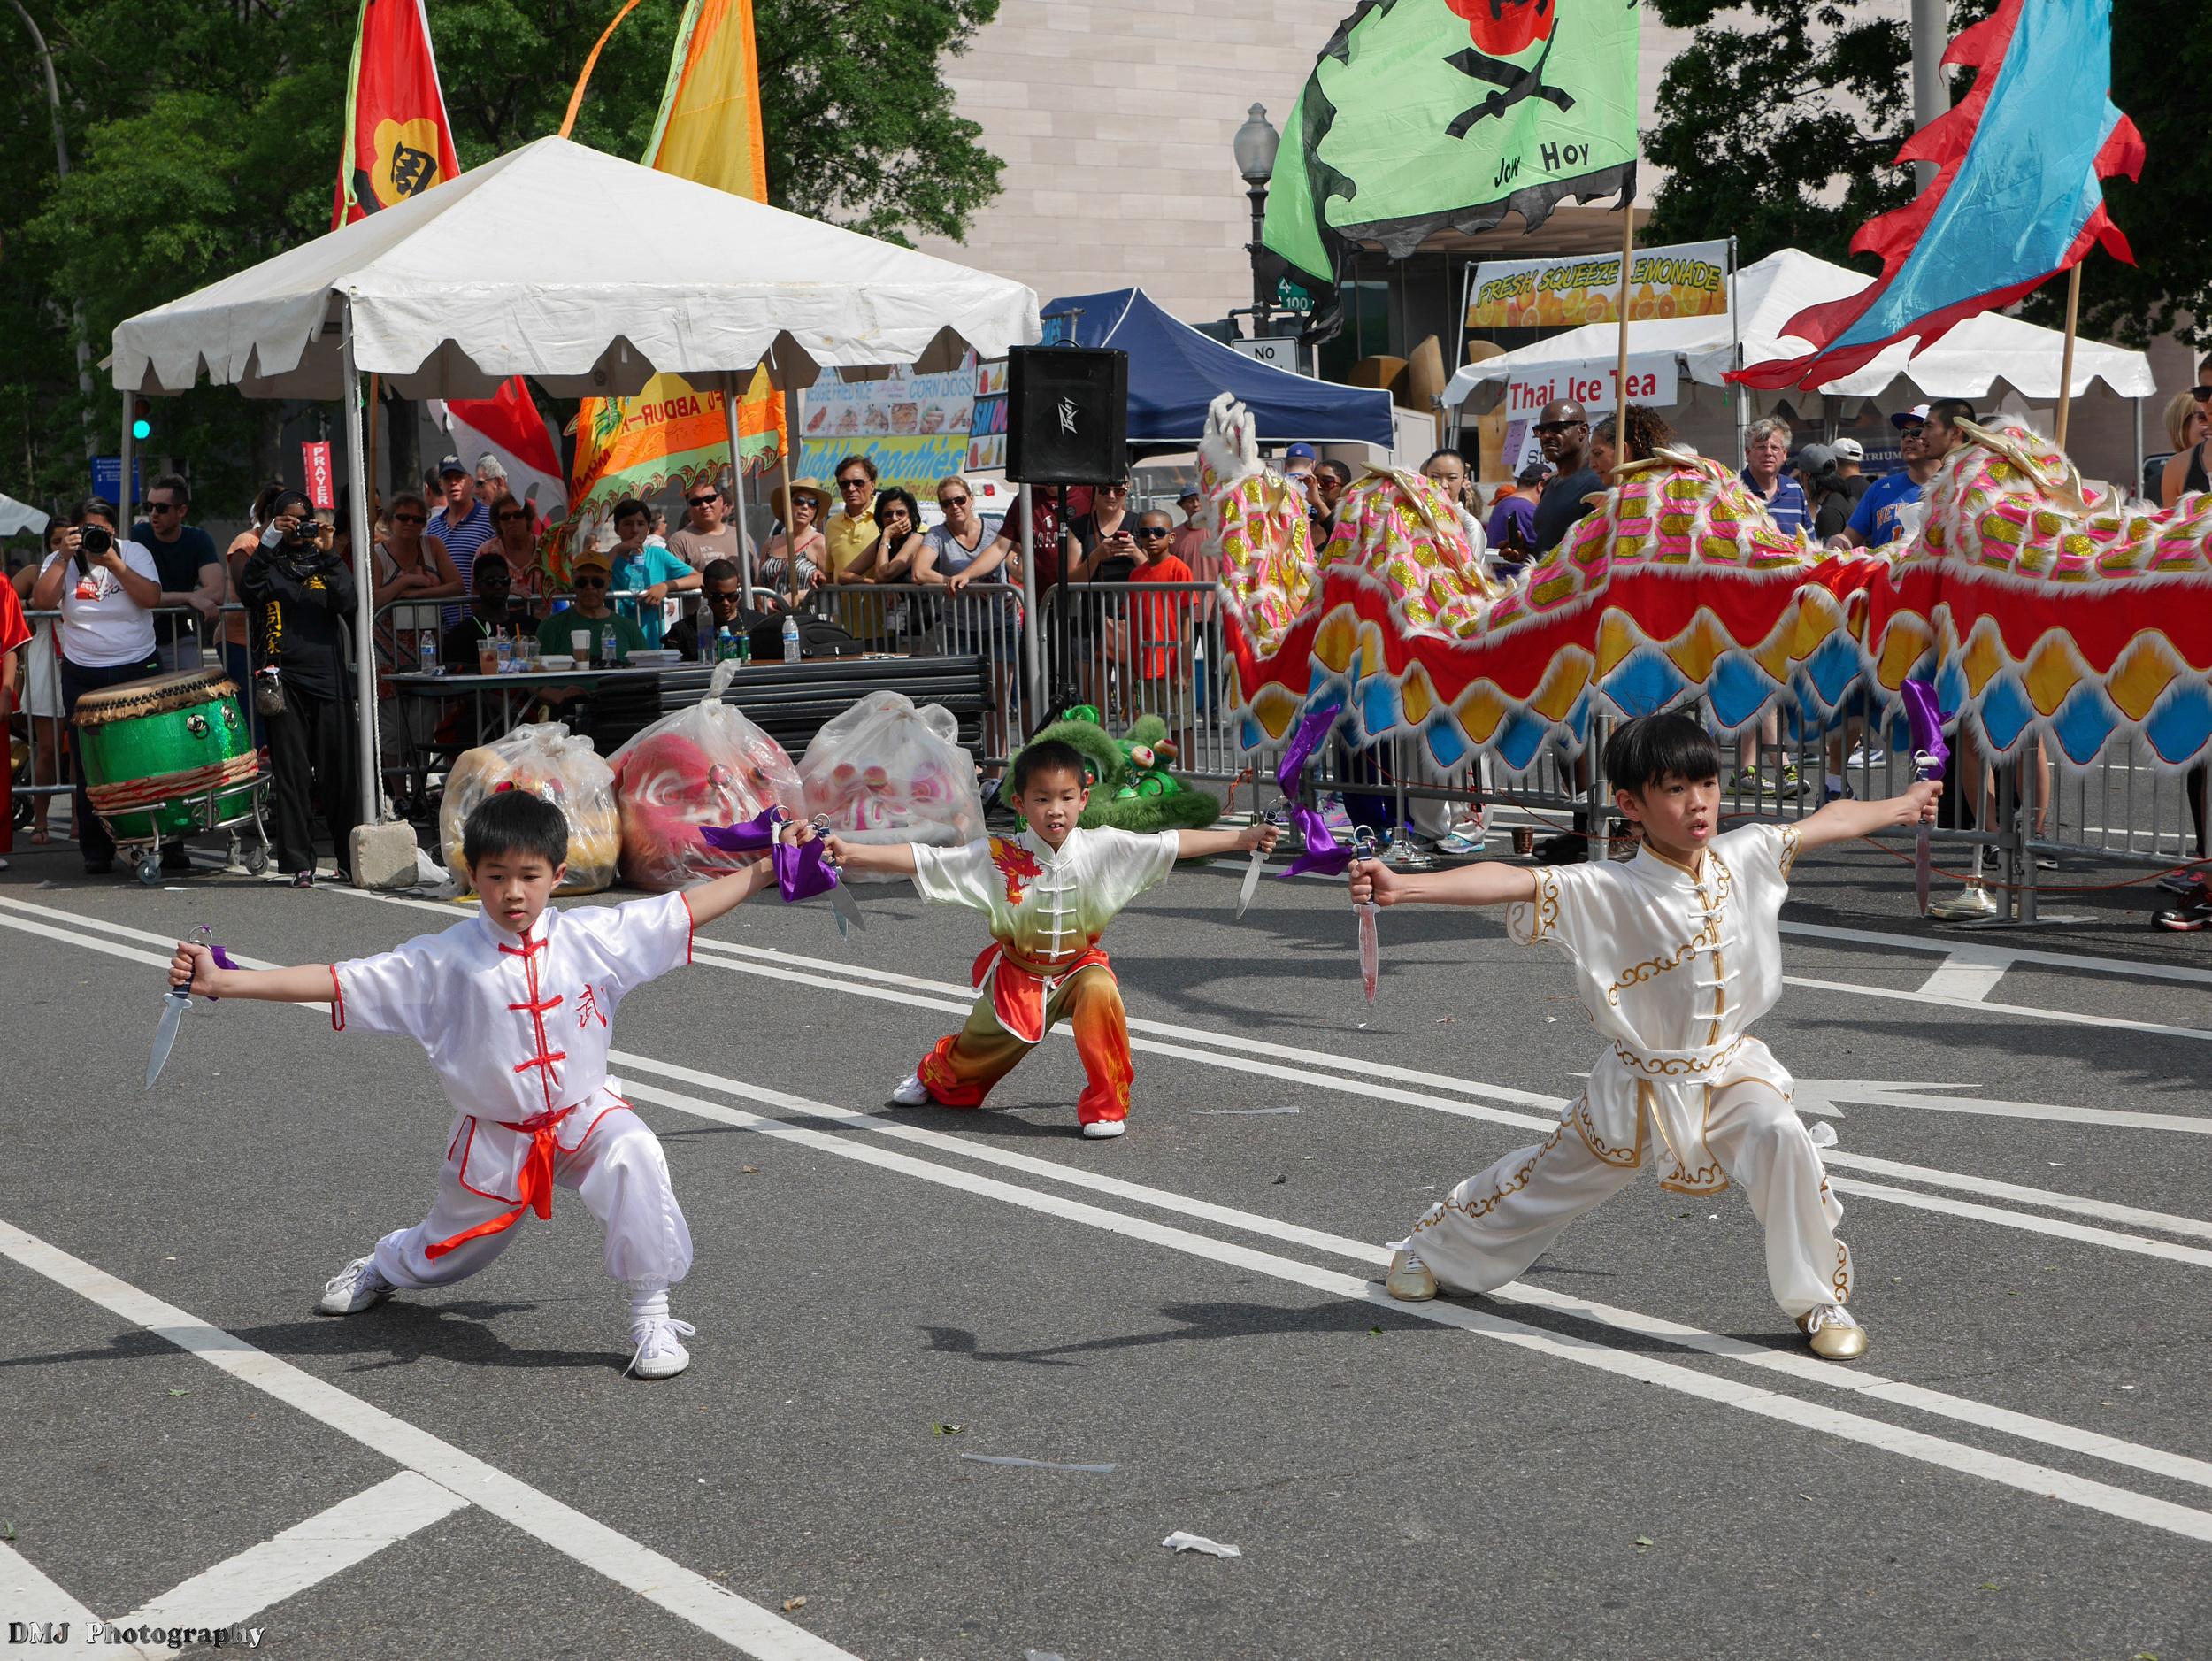 fiesta_asia_street_festival_2015_martial_arts_22.jpg